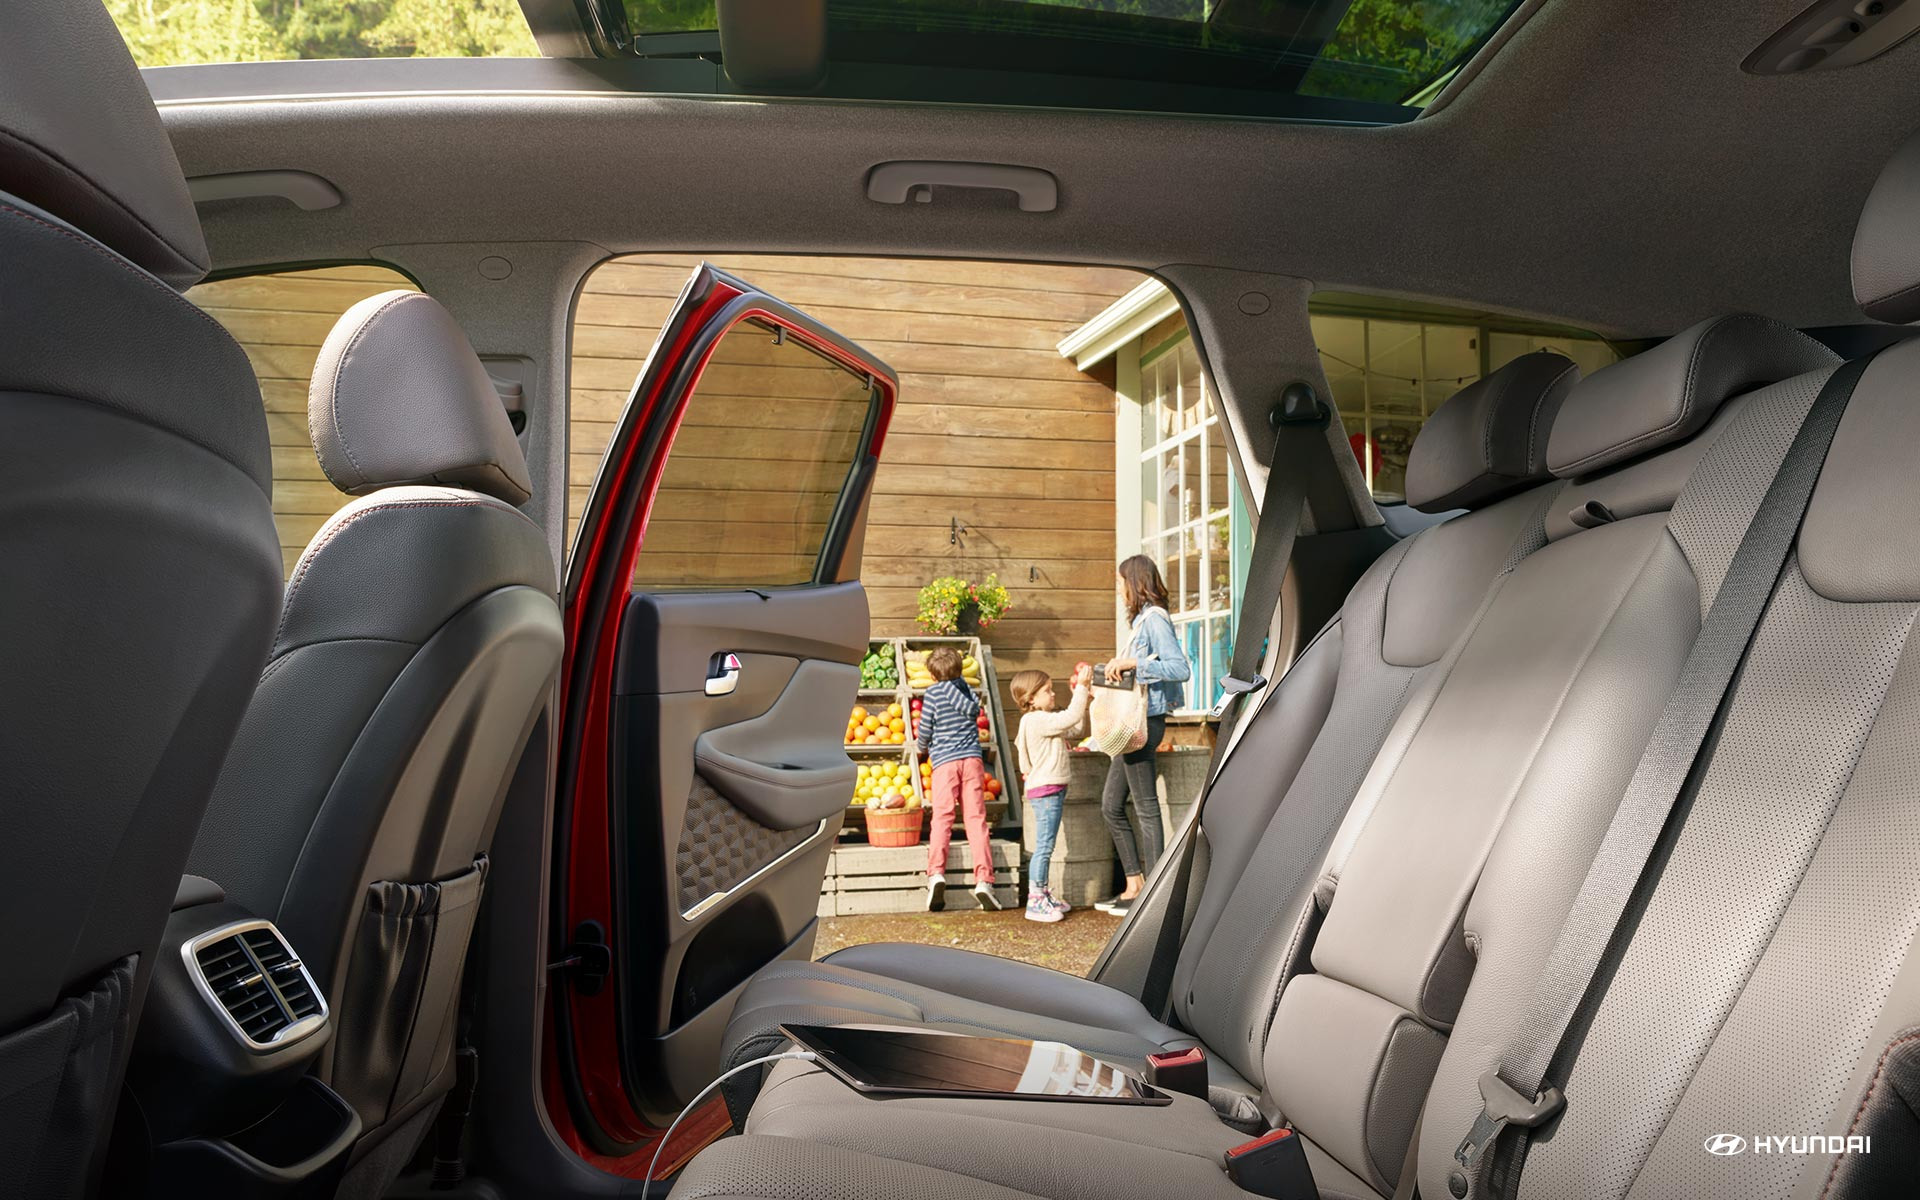 Spacious Seating in the 2020 Hyundai Santa Fe